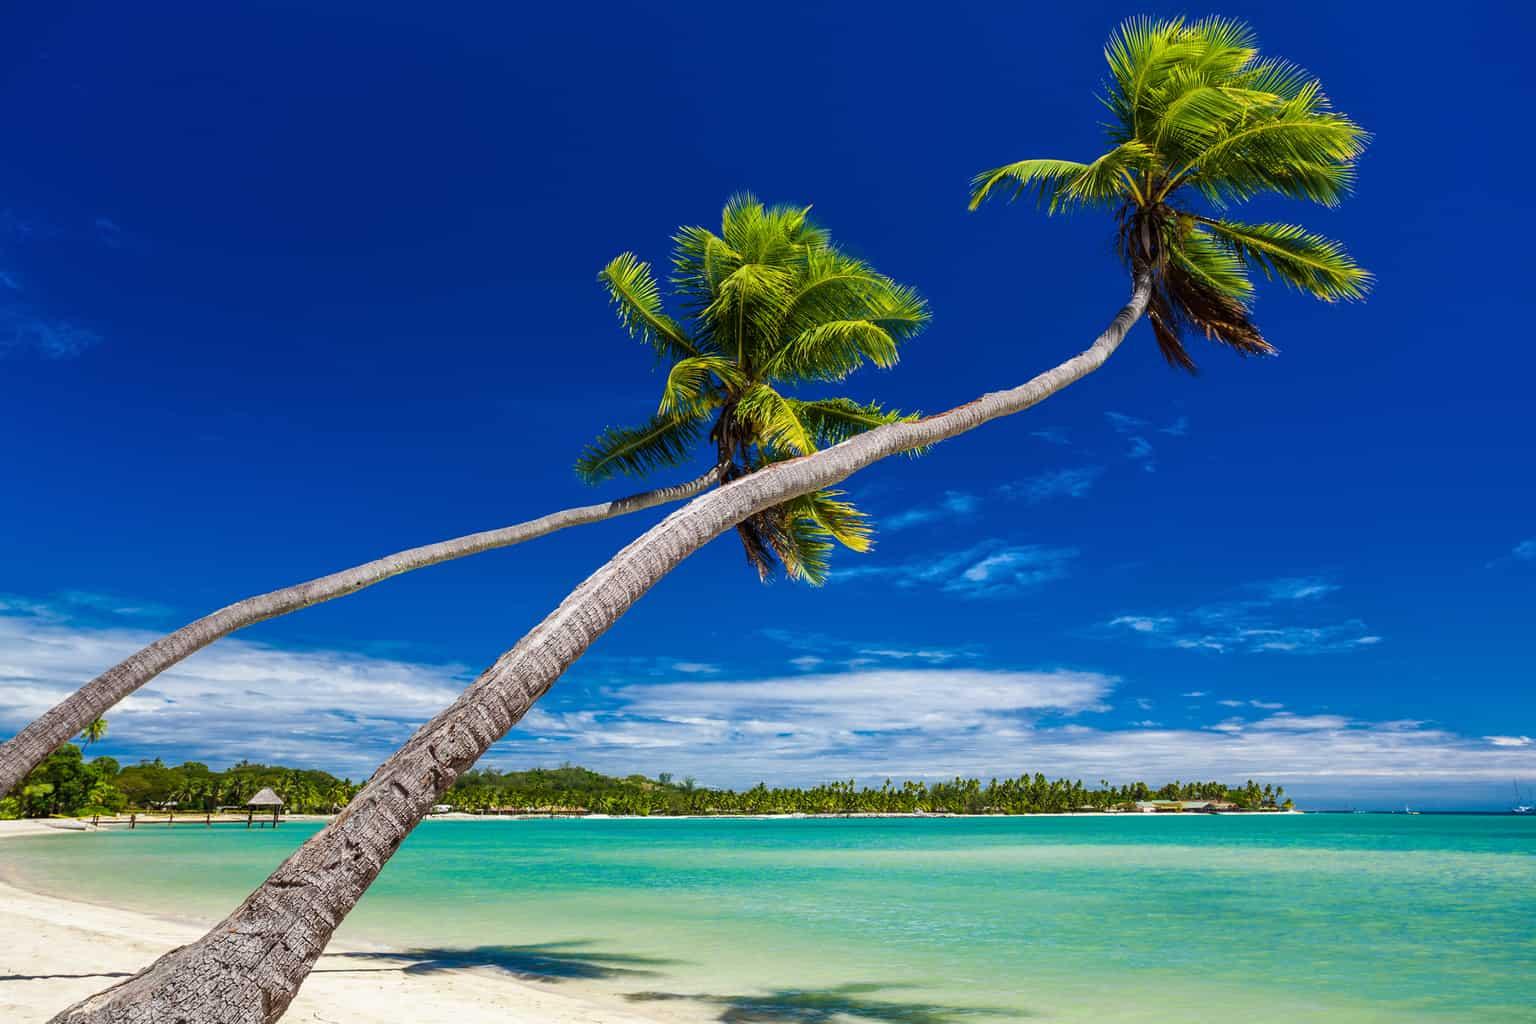 Palm trees on Fiji Islands